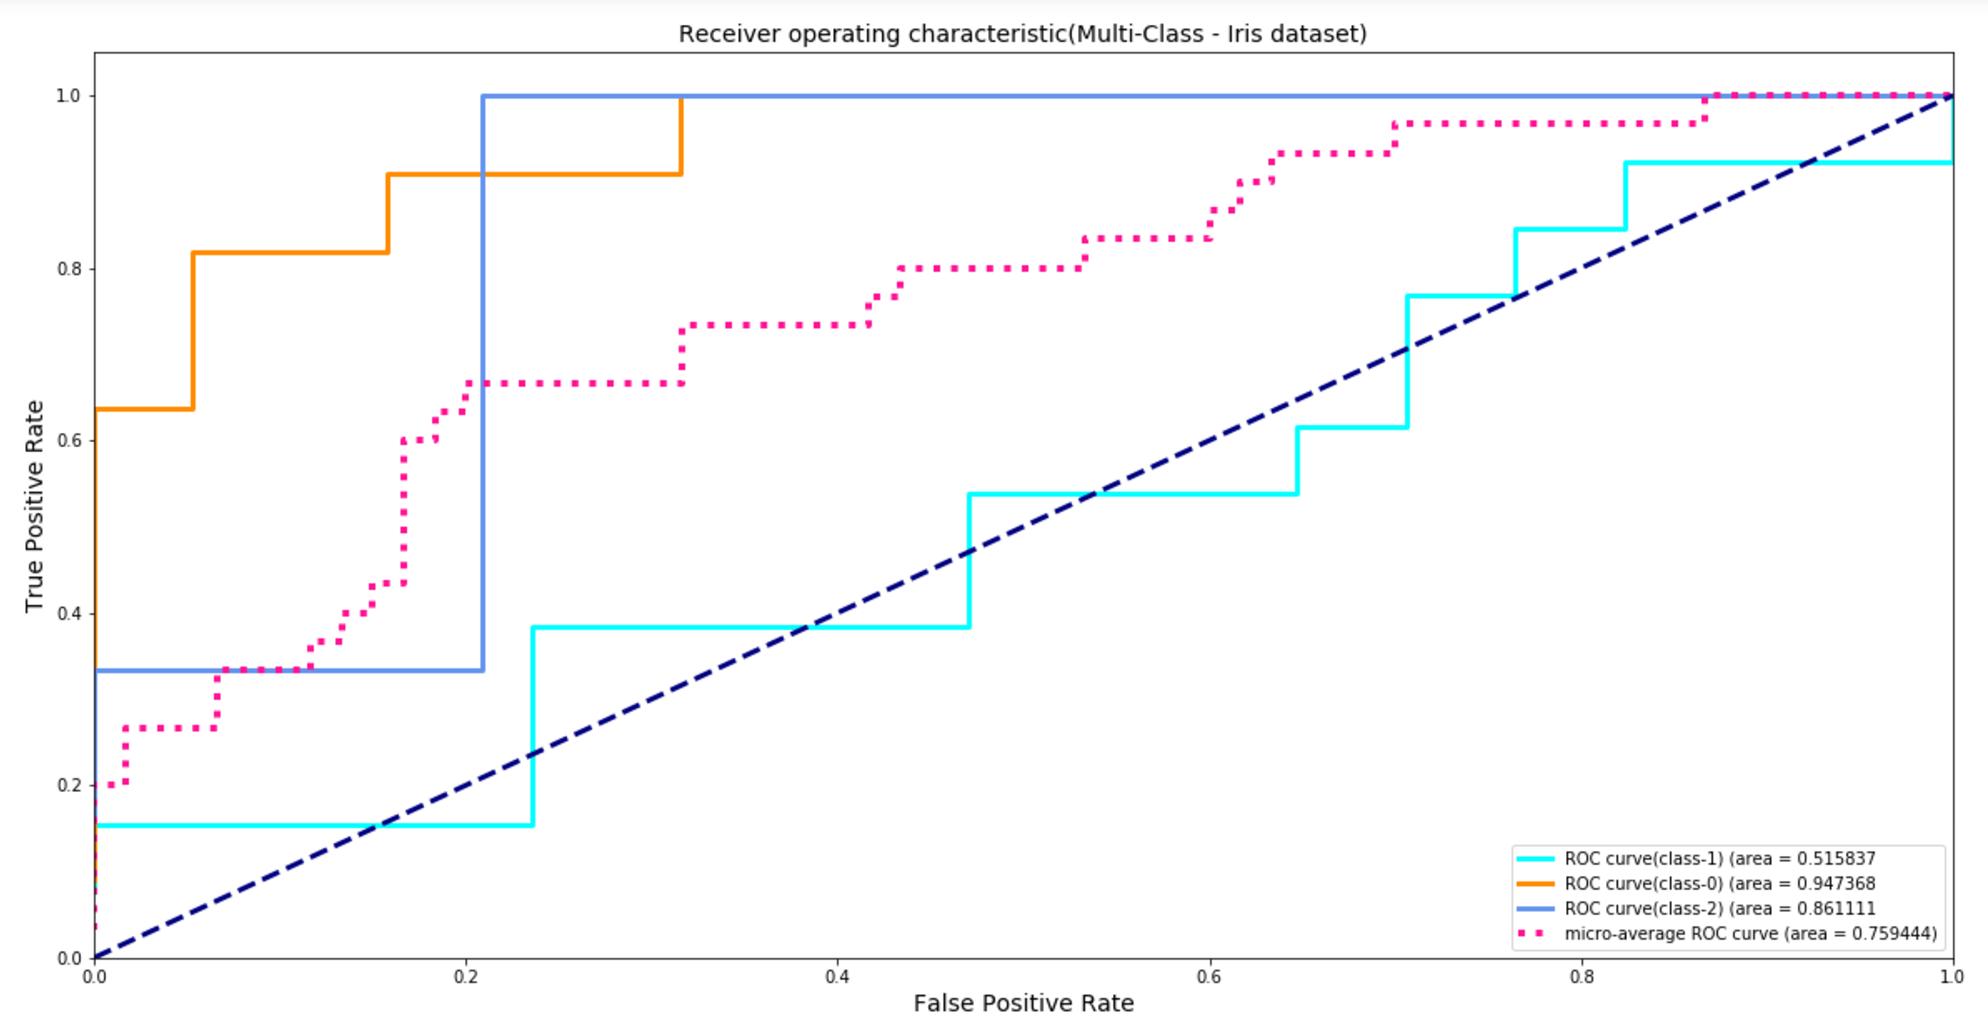 Measuring model performance ROC curve